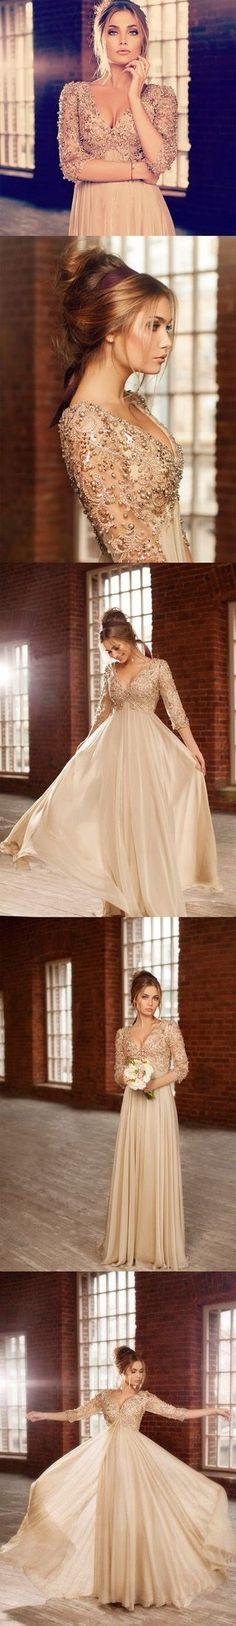 $144--Beautiful Long Prom Dresses 2014 New Arrival Deep V-neck 3/4 Sleeves Beaded A-line Chiffon Evening Dresses